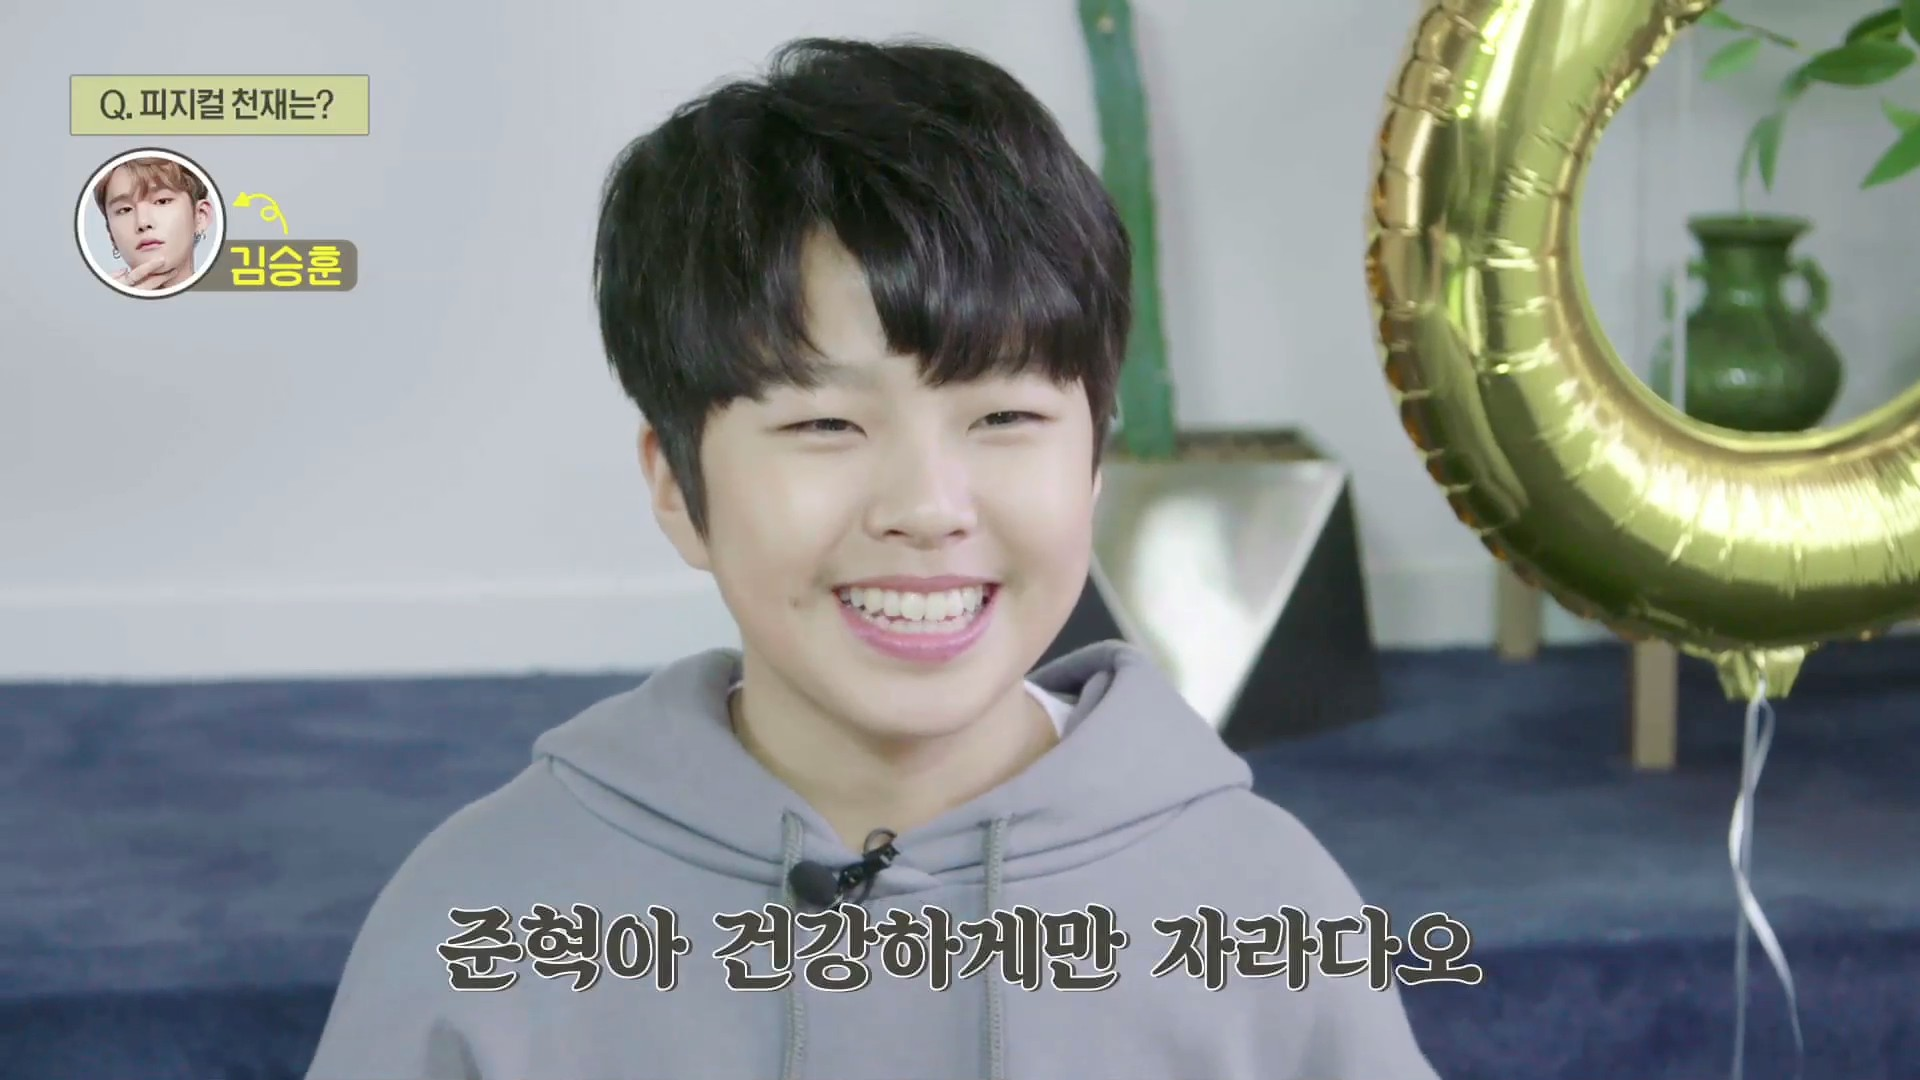 [SURVEY CAM] C#3 정준혁 <JUNG JUNHYUK> l YG보석함